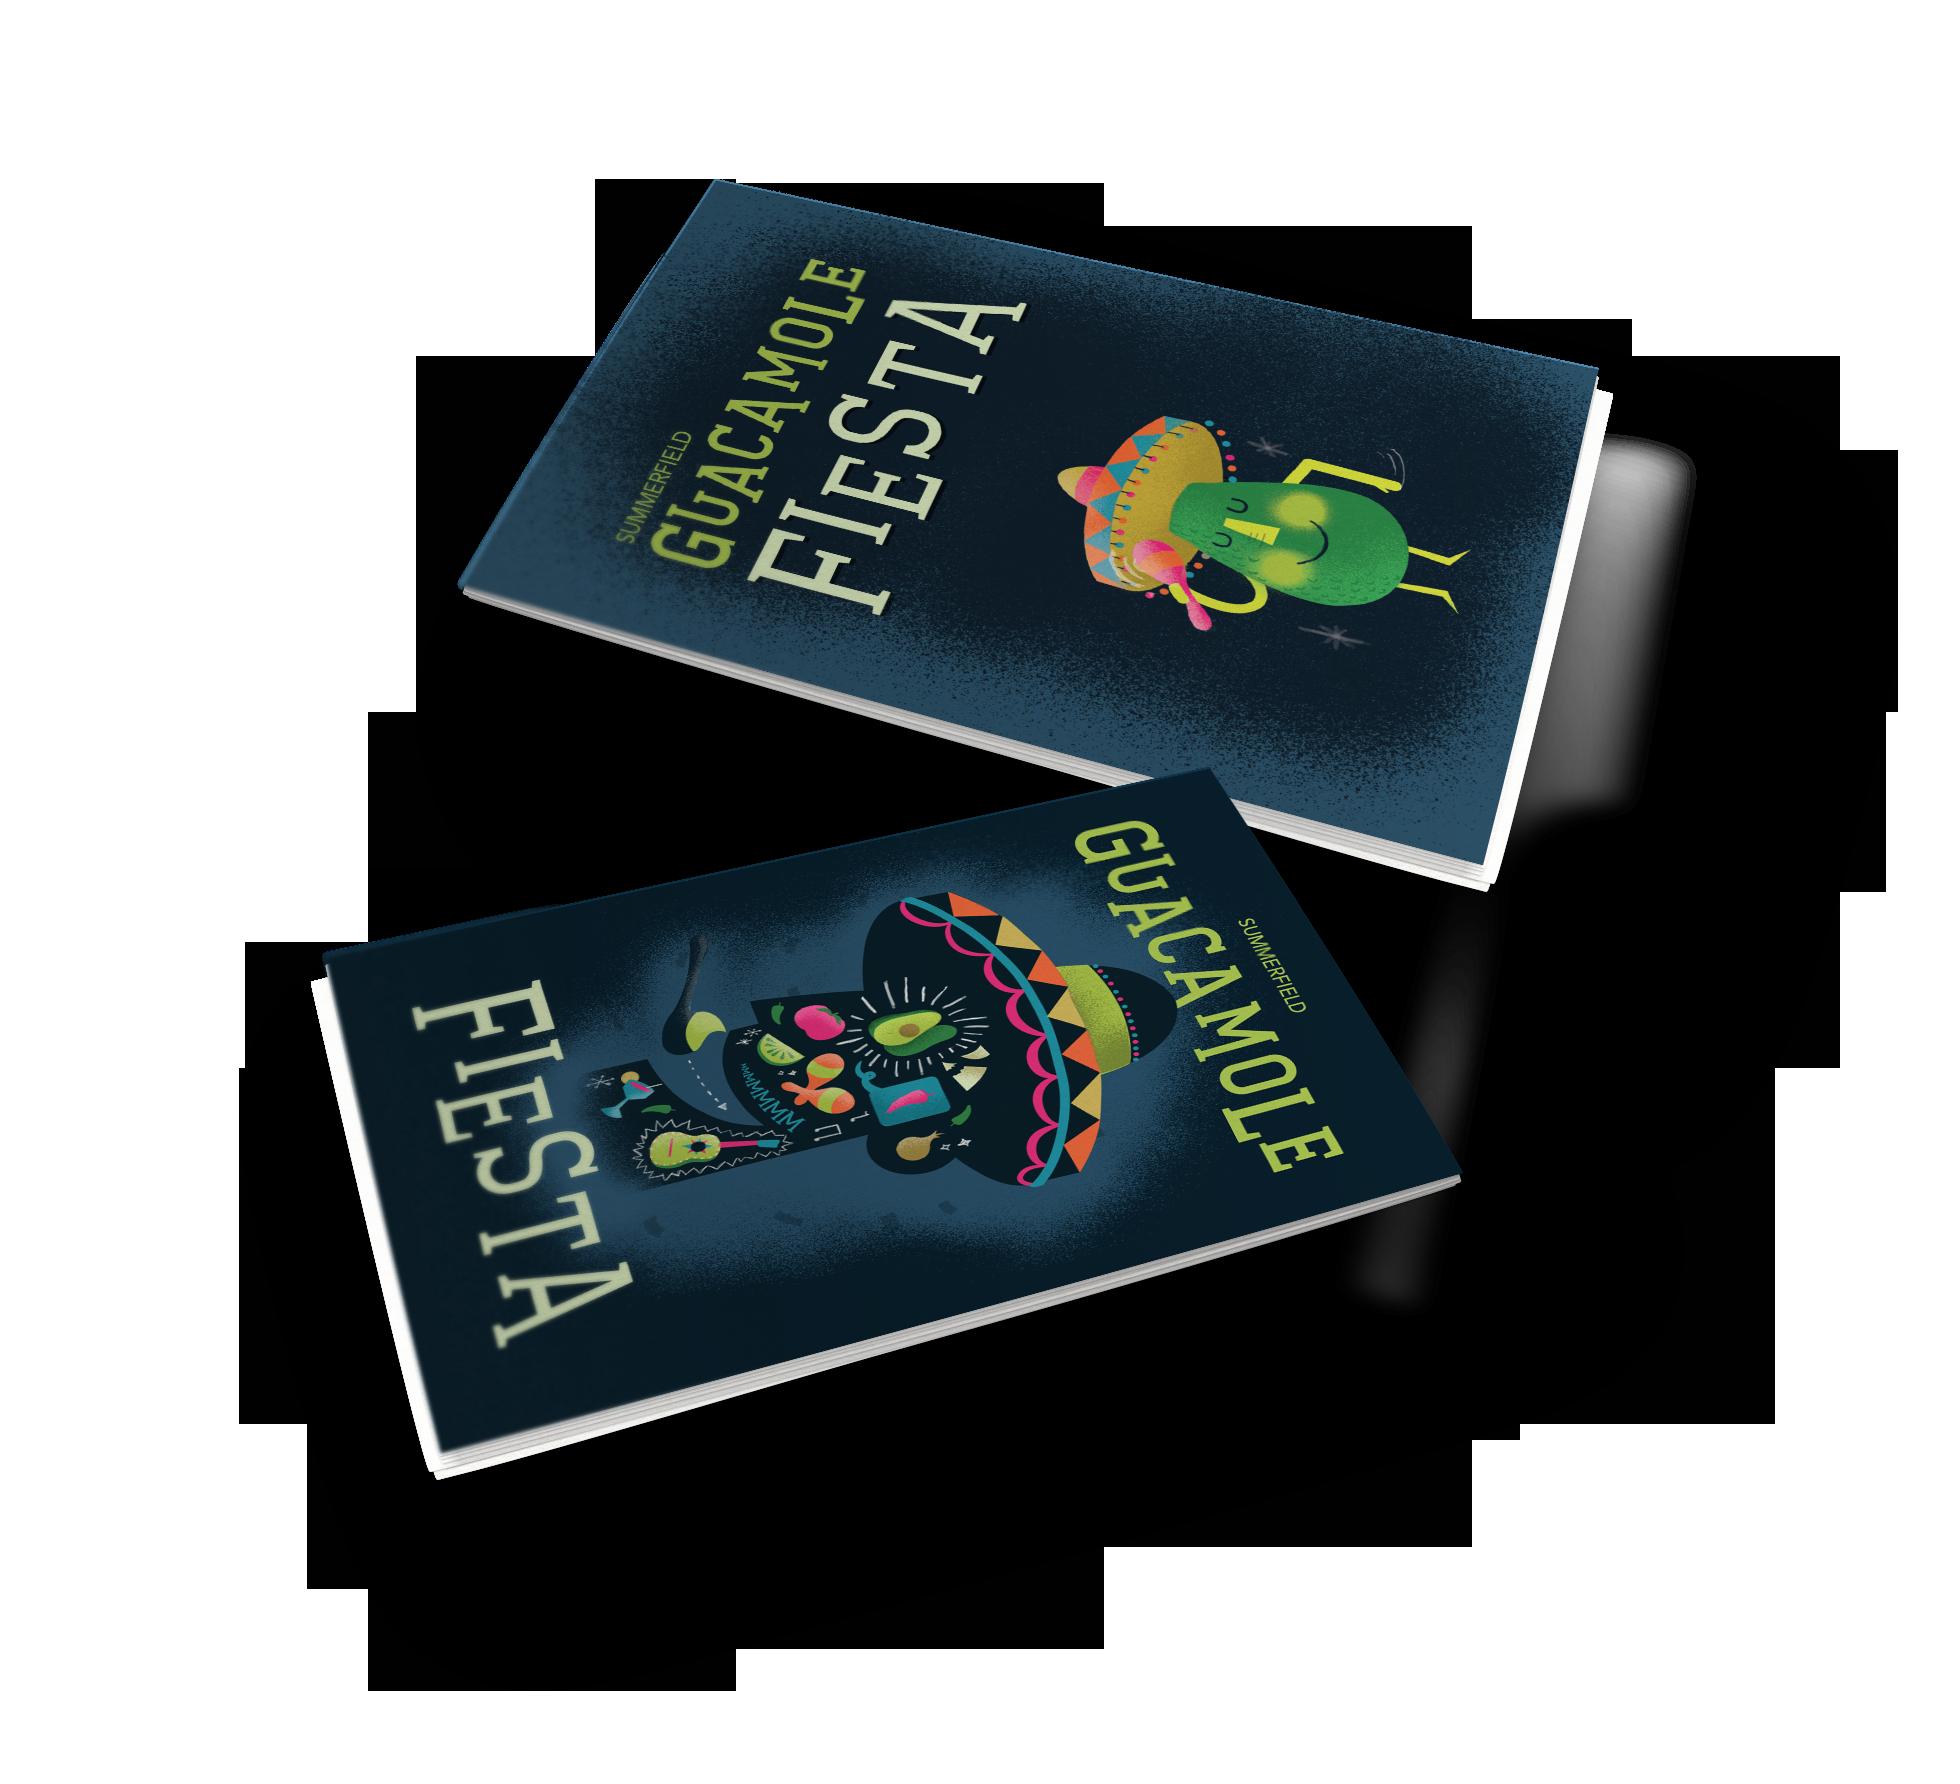 Business-card-mock-up-Vol2.png